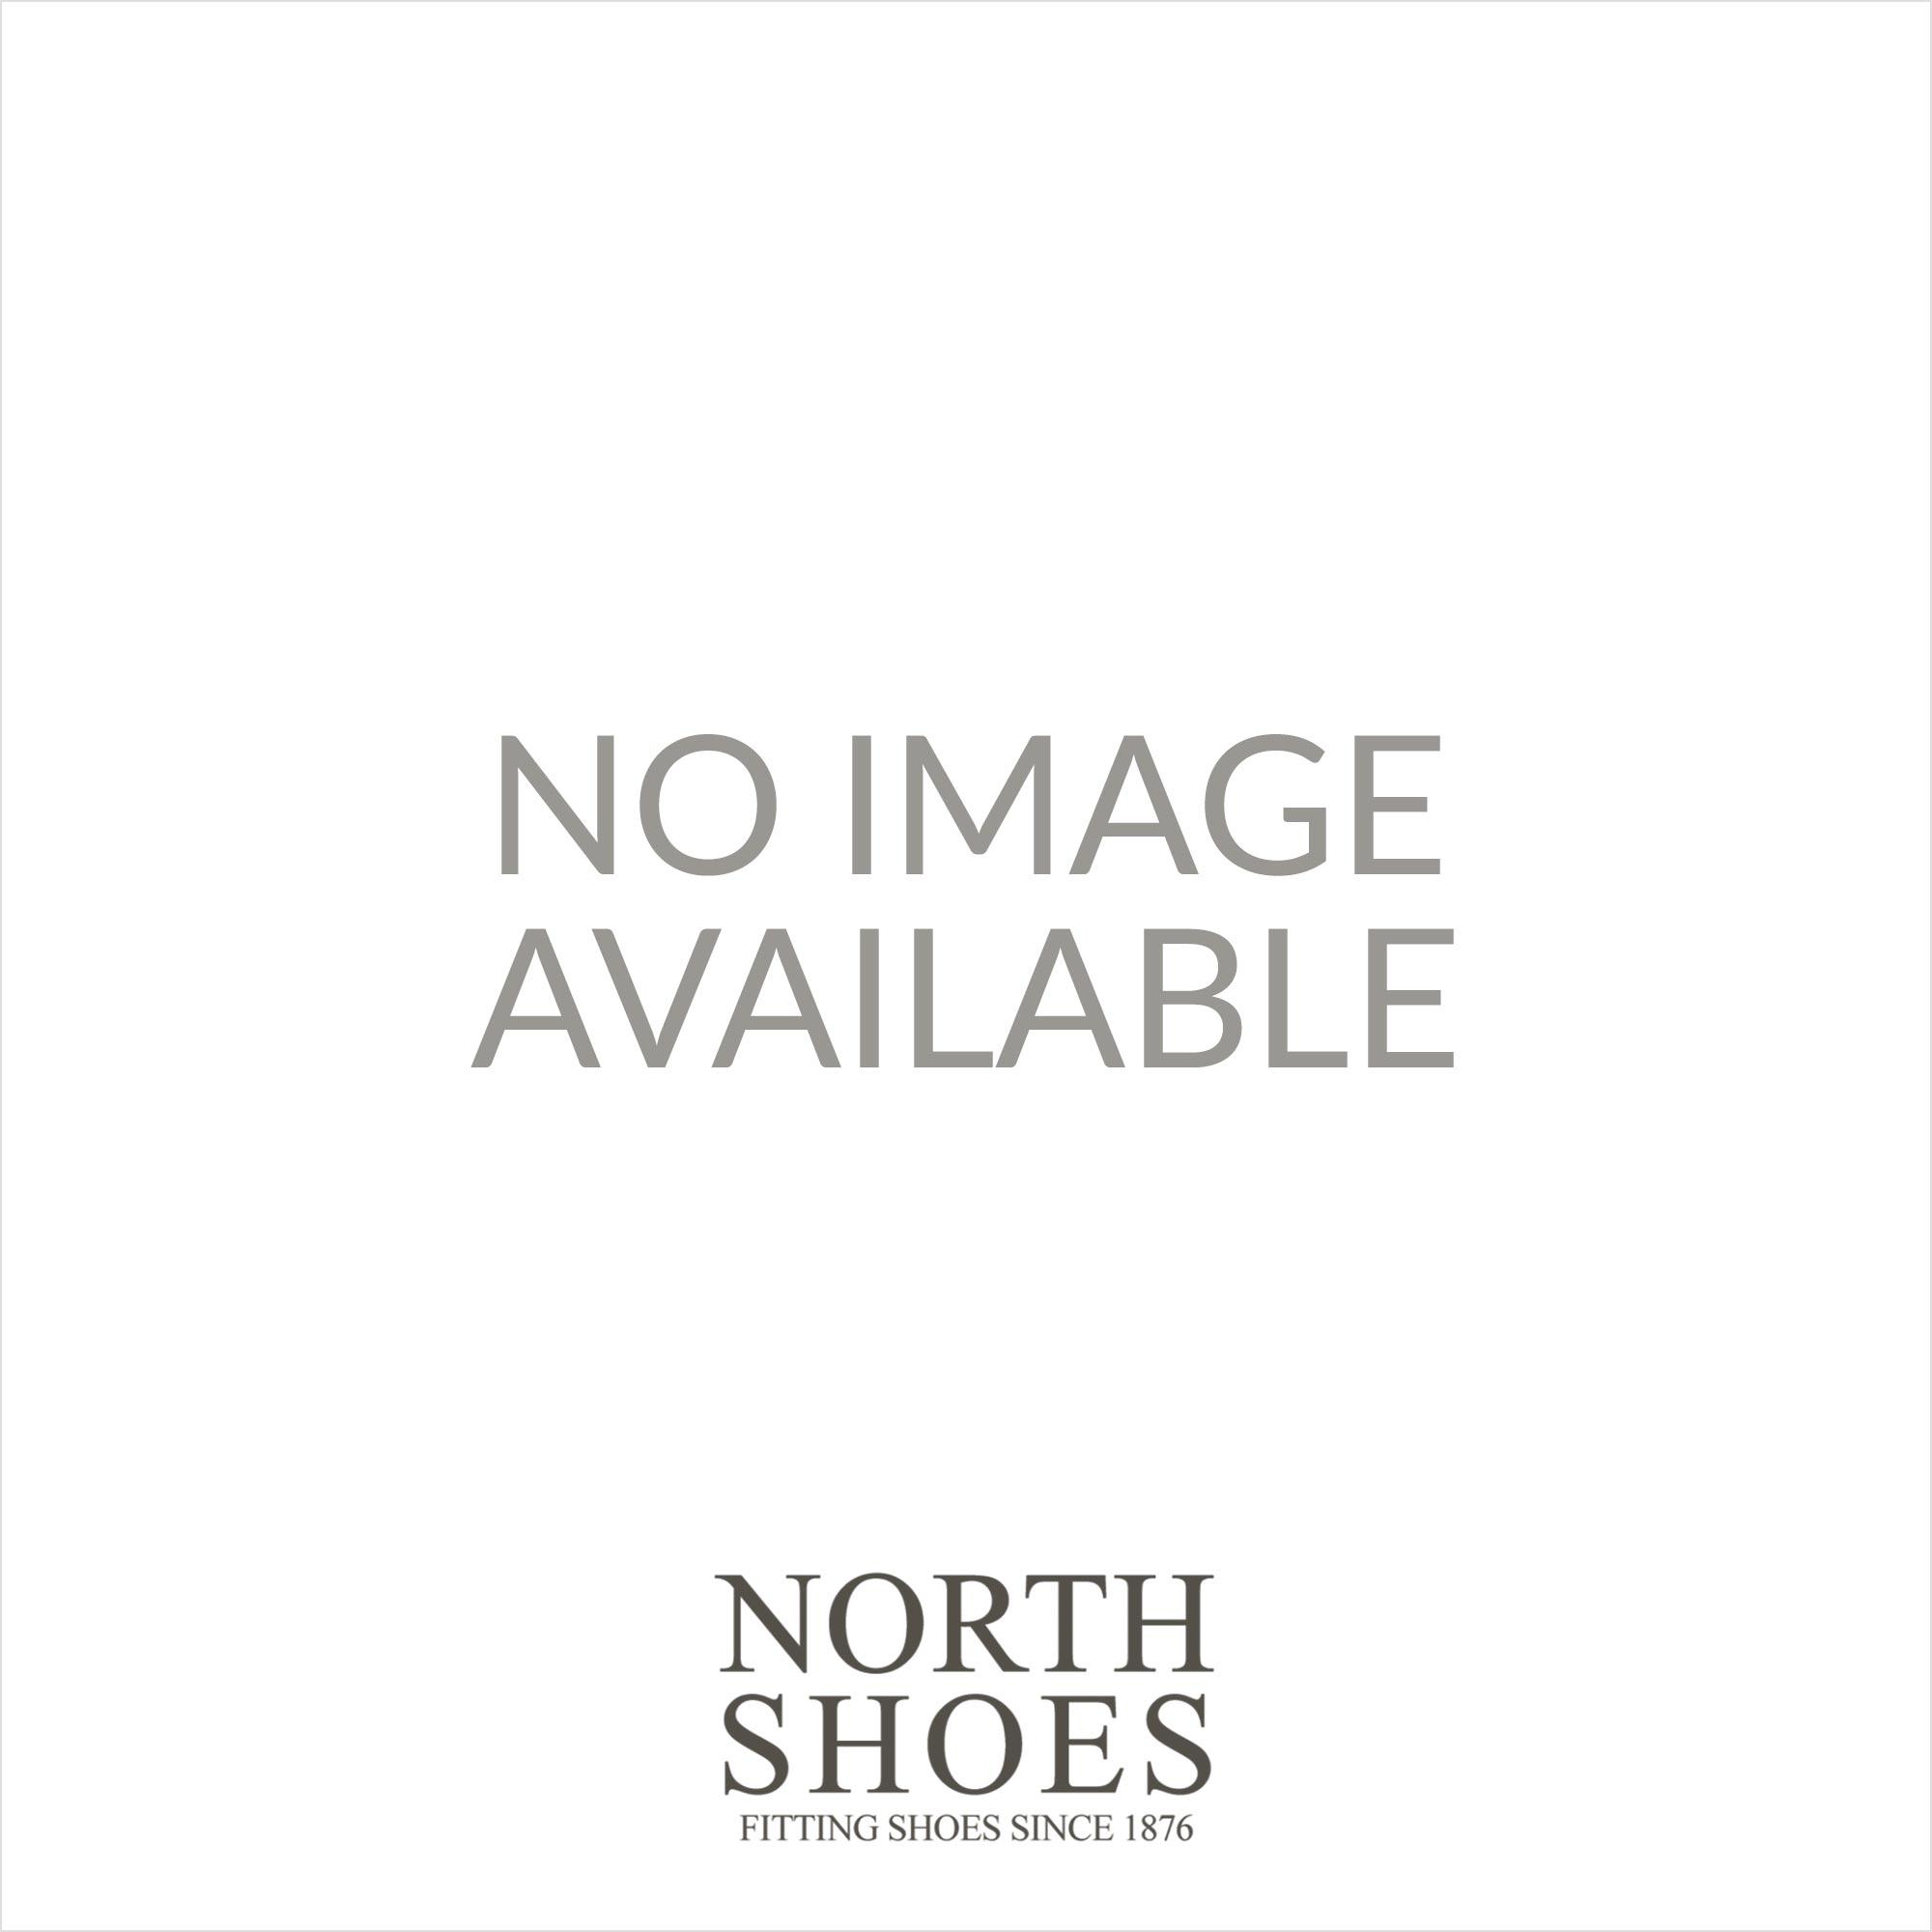 tamaris 25604 27 brown womens boot tamaris from north shoes uk. Black Bedroom Furniture Sets. Home Design Ideas